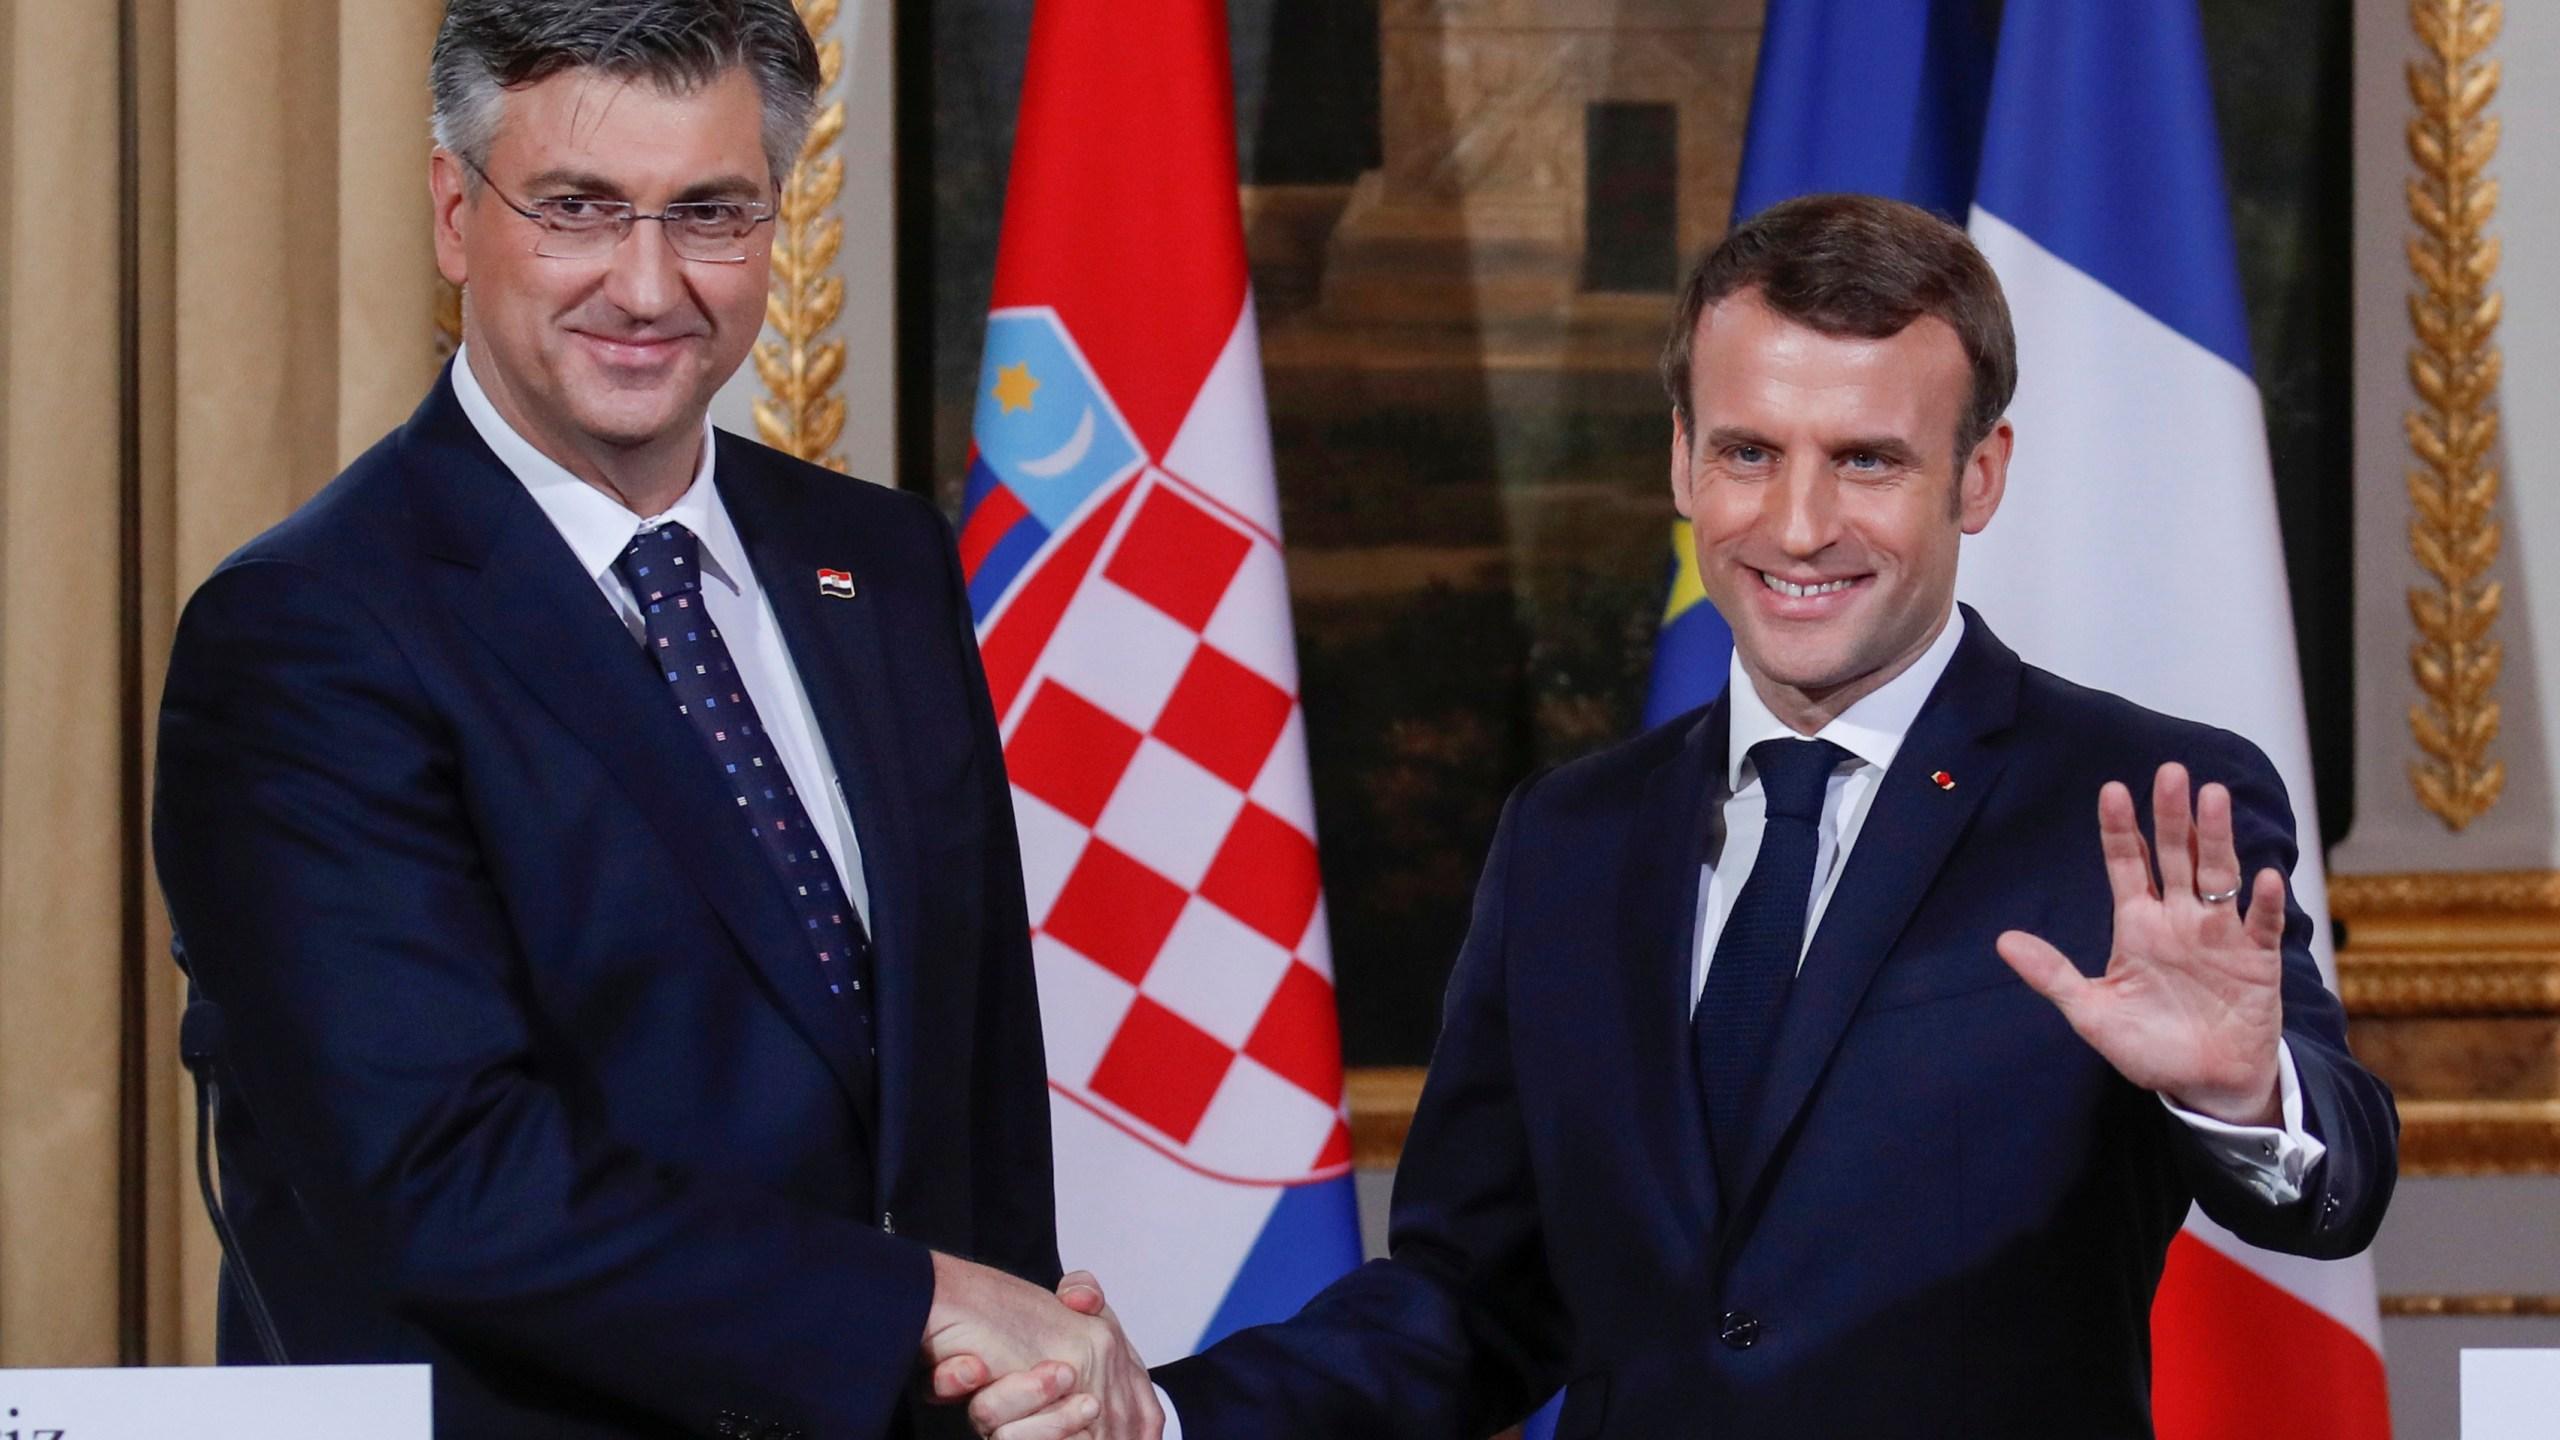 French President Emmanuel Macron meets Croatian Prime Minister Andrej Plenkovic in Paris